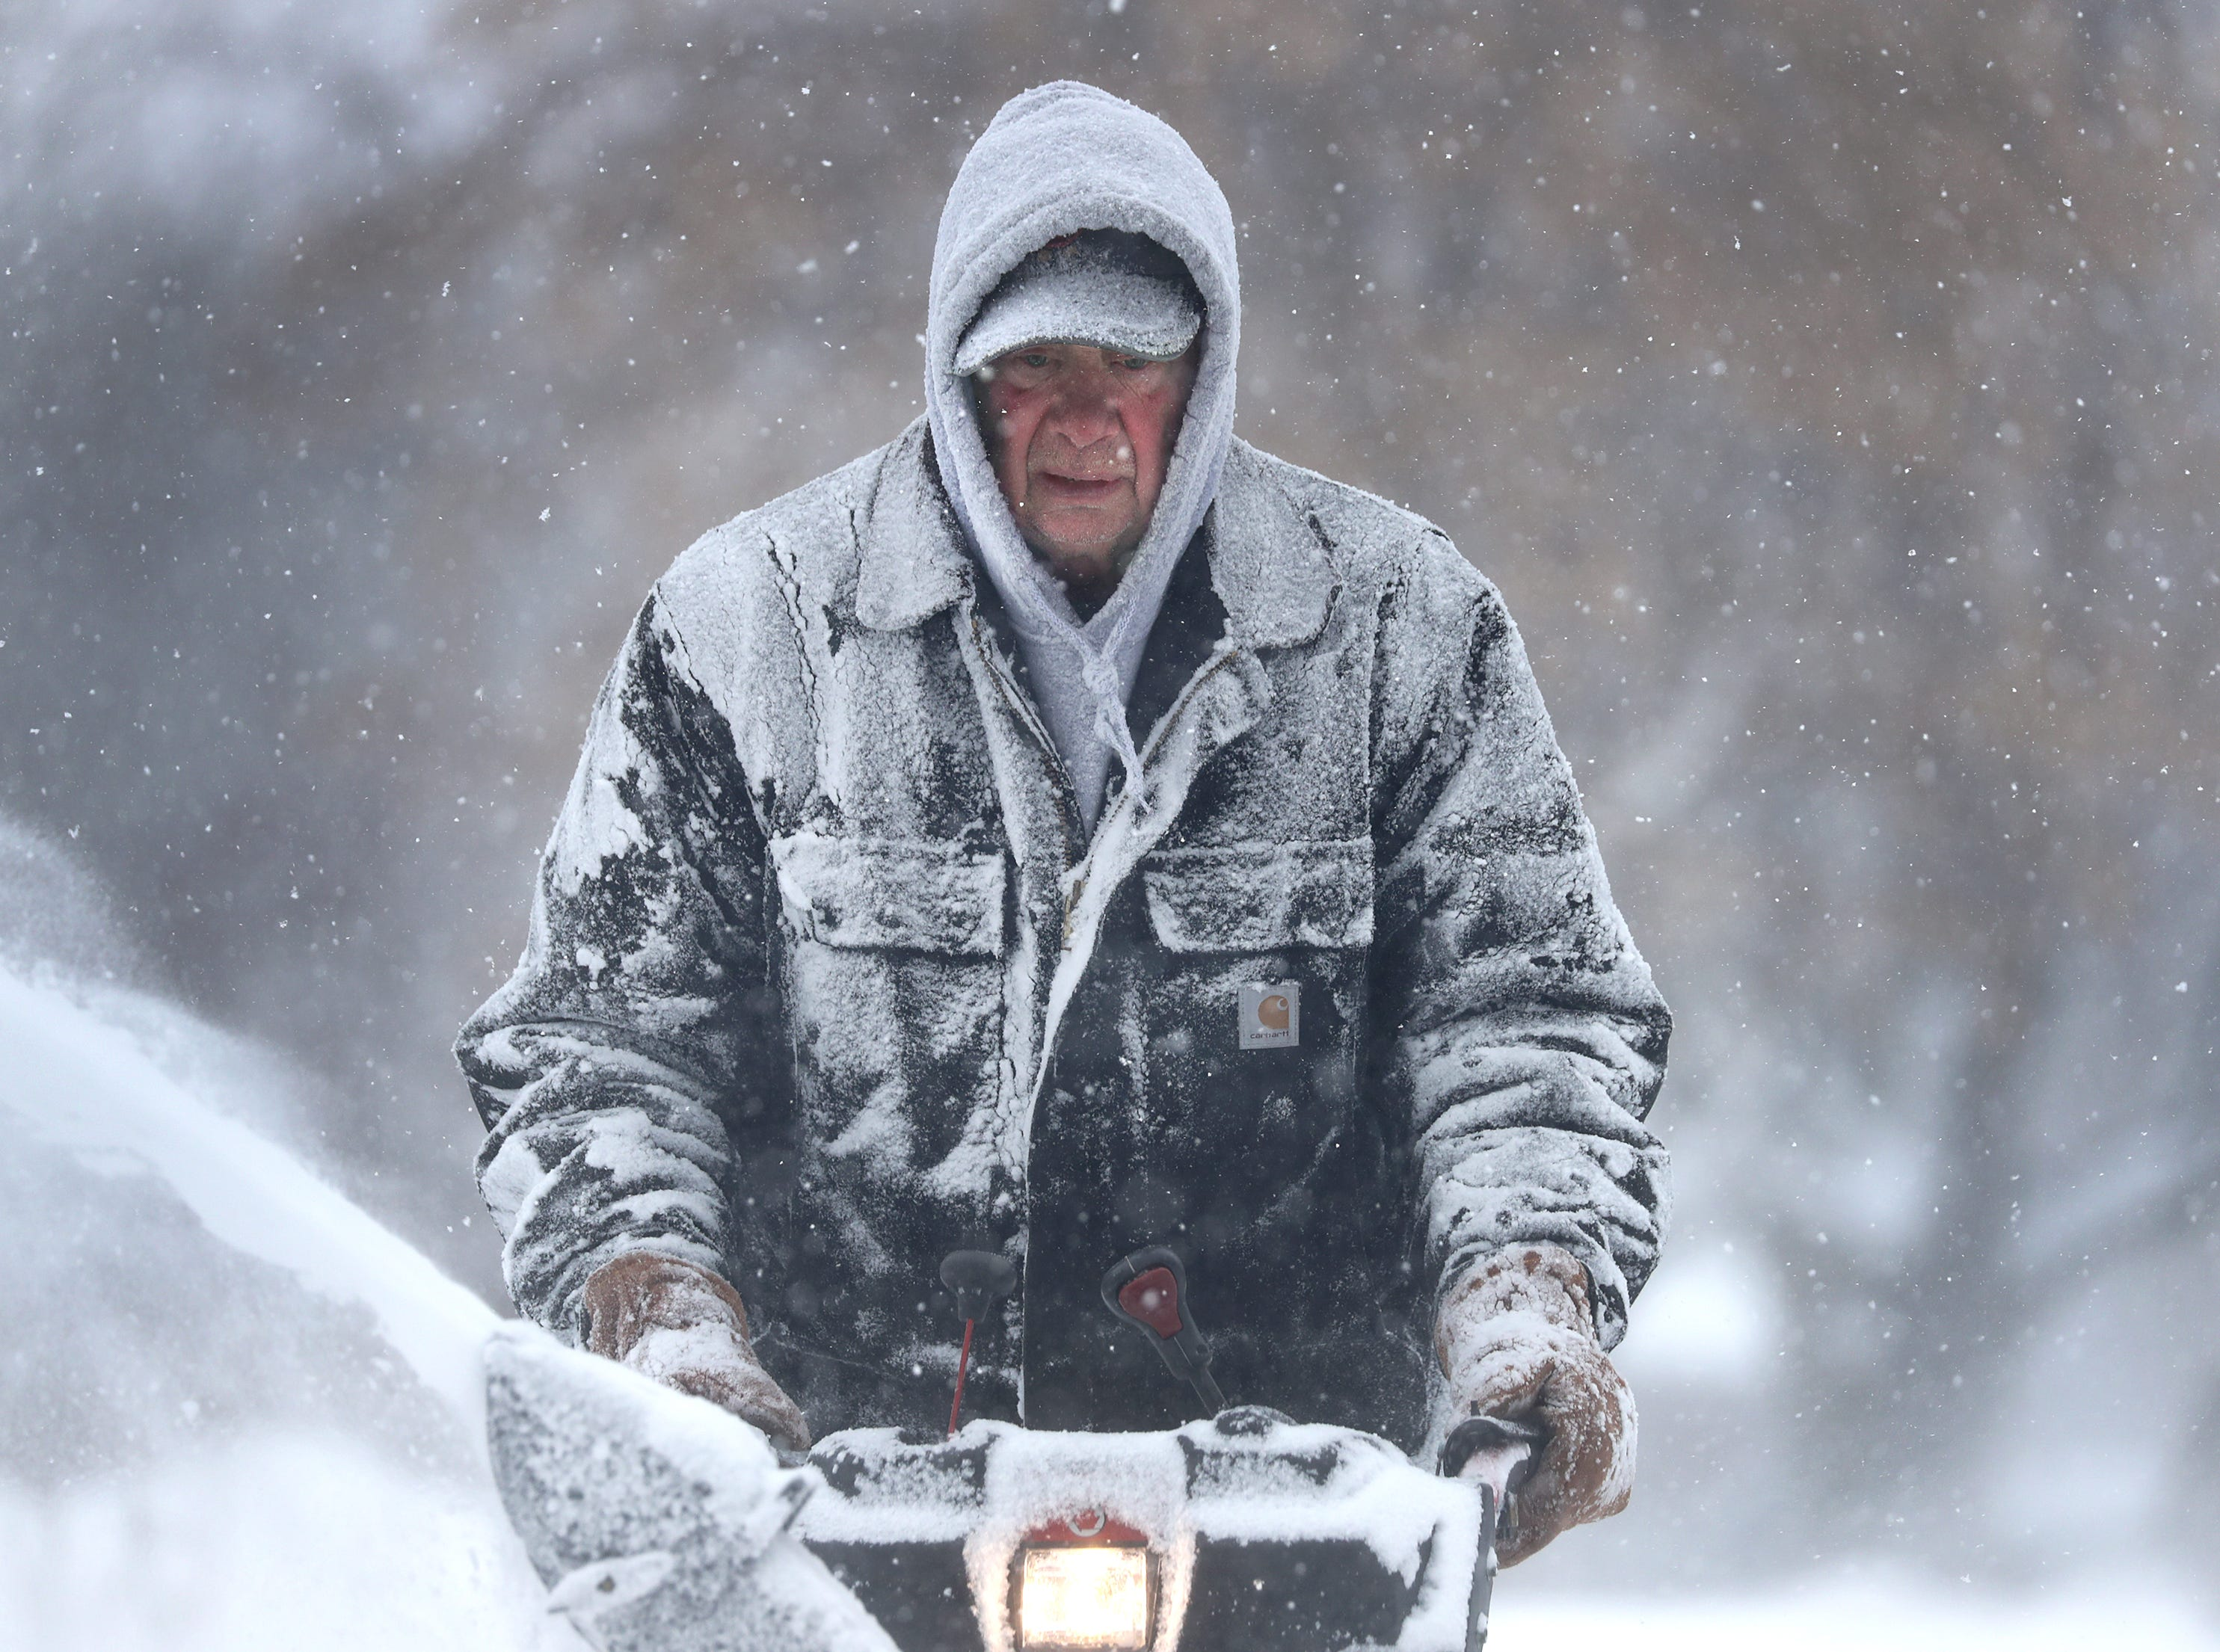 Gary Verstegen clears a sidewalk as a winter storm moves through Wisconsin on Monday, Jan. 28, 2019, in Little Chute, Wis.